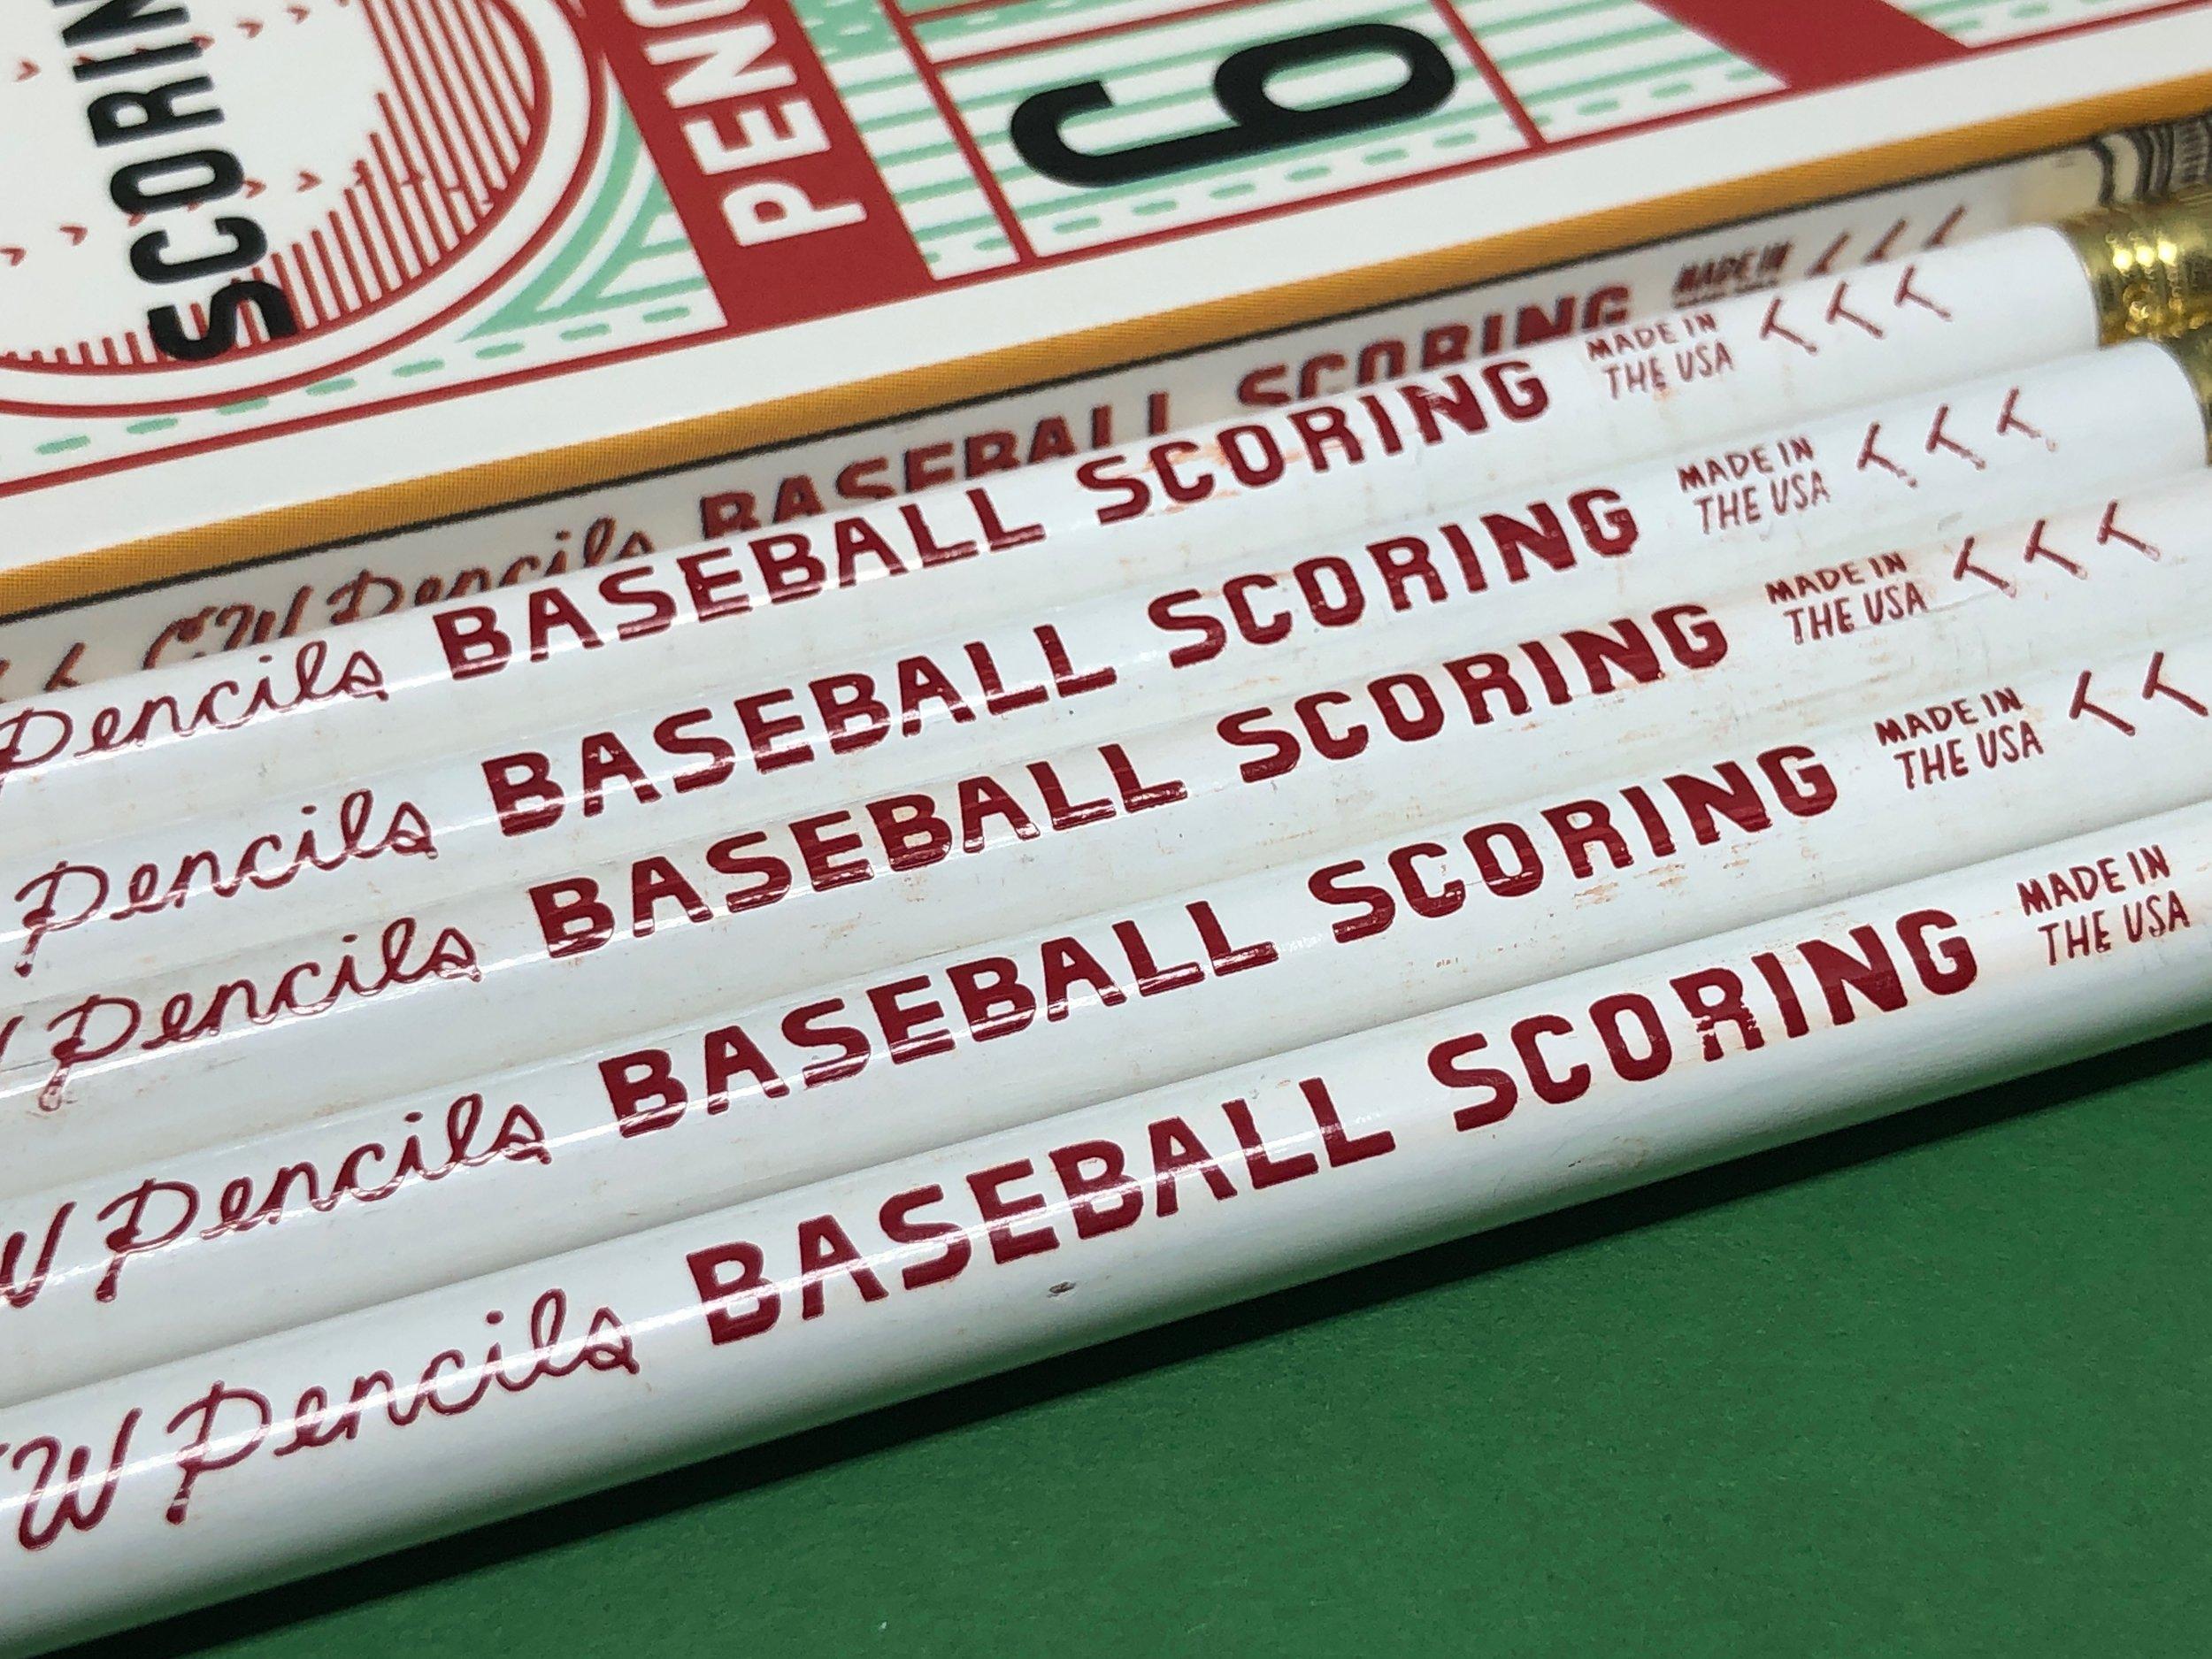 cwpe-generals-baseball-scoring-pencil-1.jpg